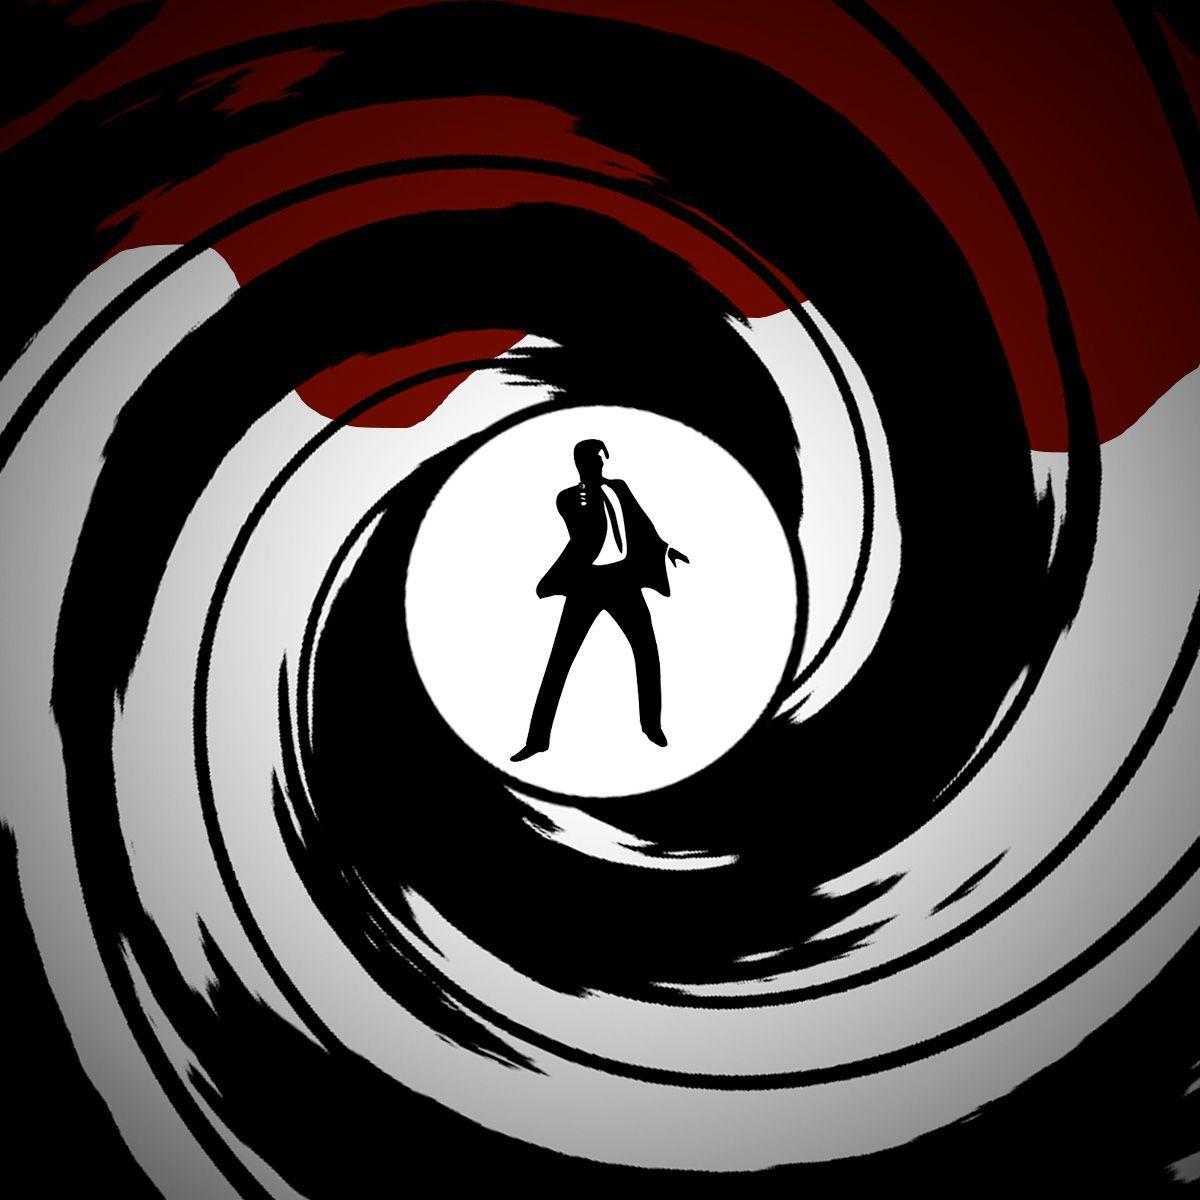 James bond 007 logo wallpapers wallpaper cave - James bond wallpaper iphone 5 ...